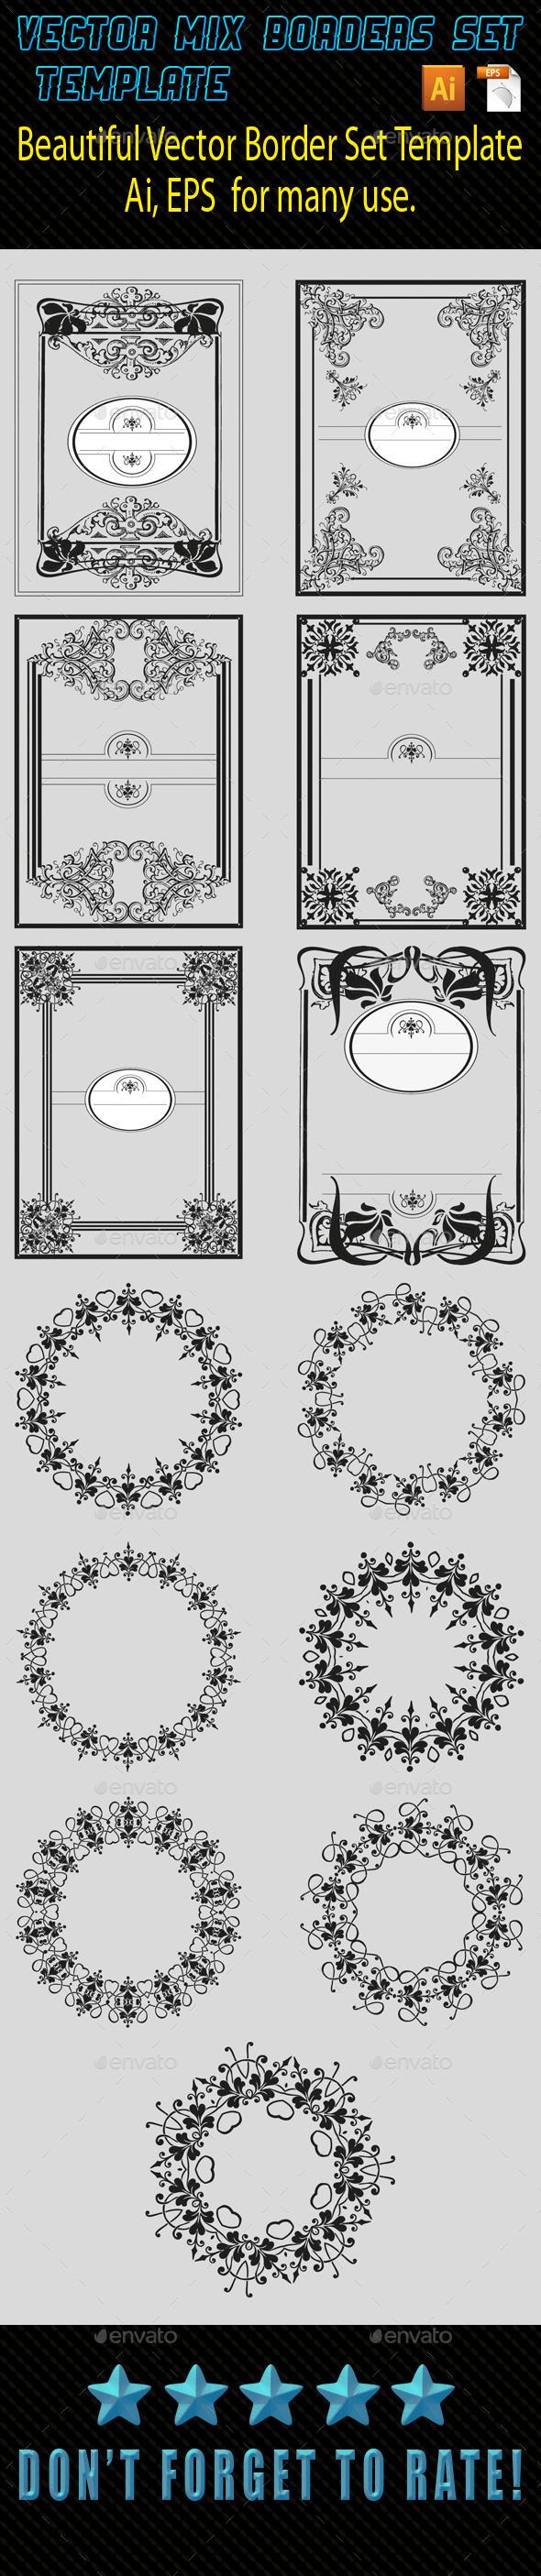 Vector Mix Borders Template 02 - Borders Decorative